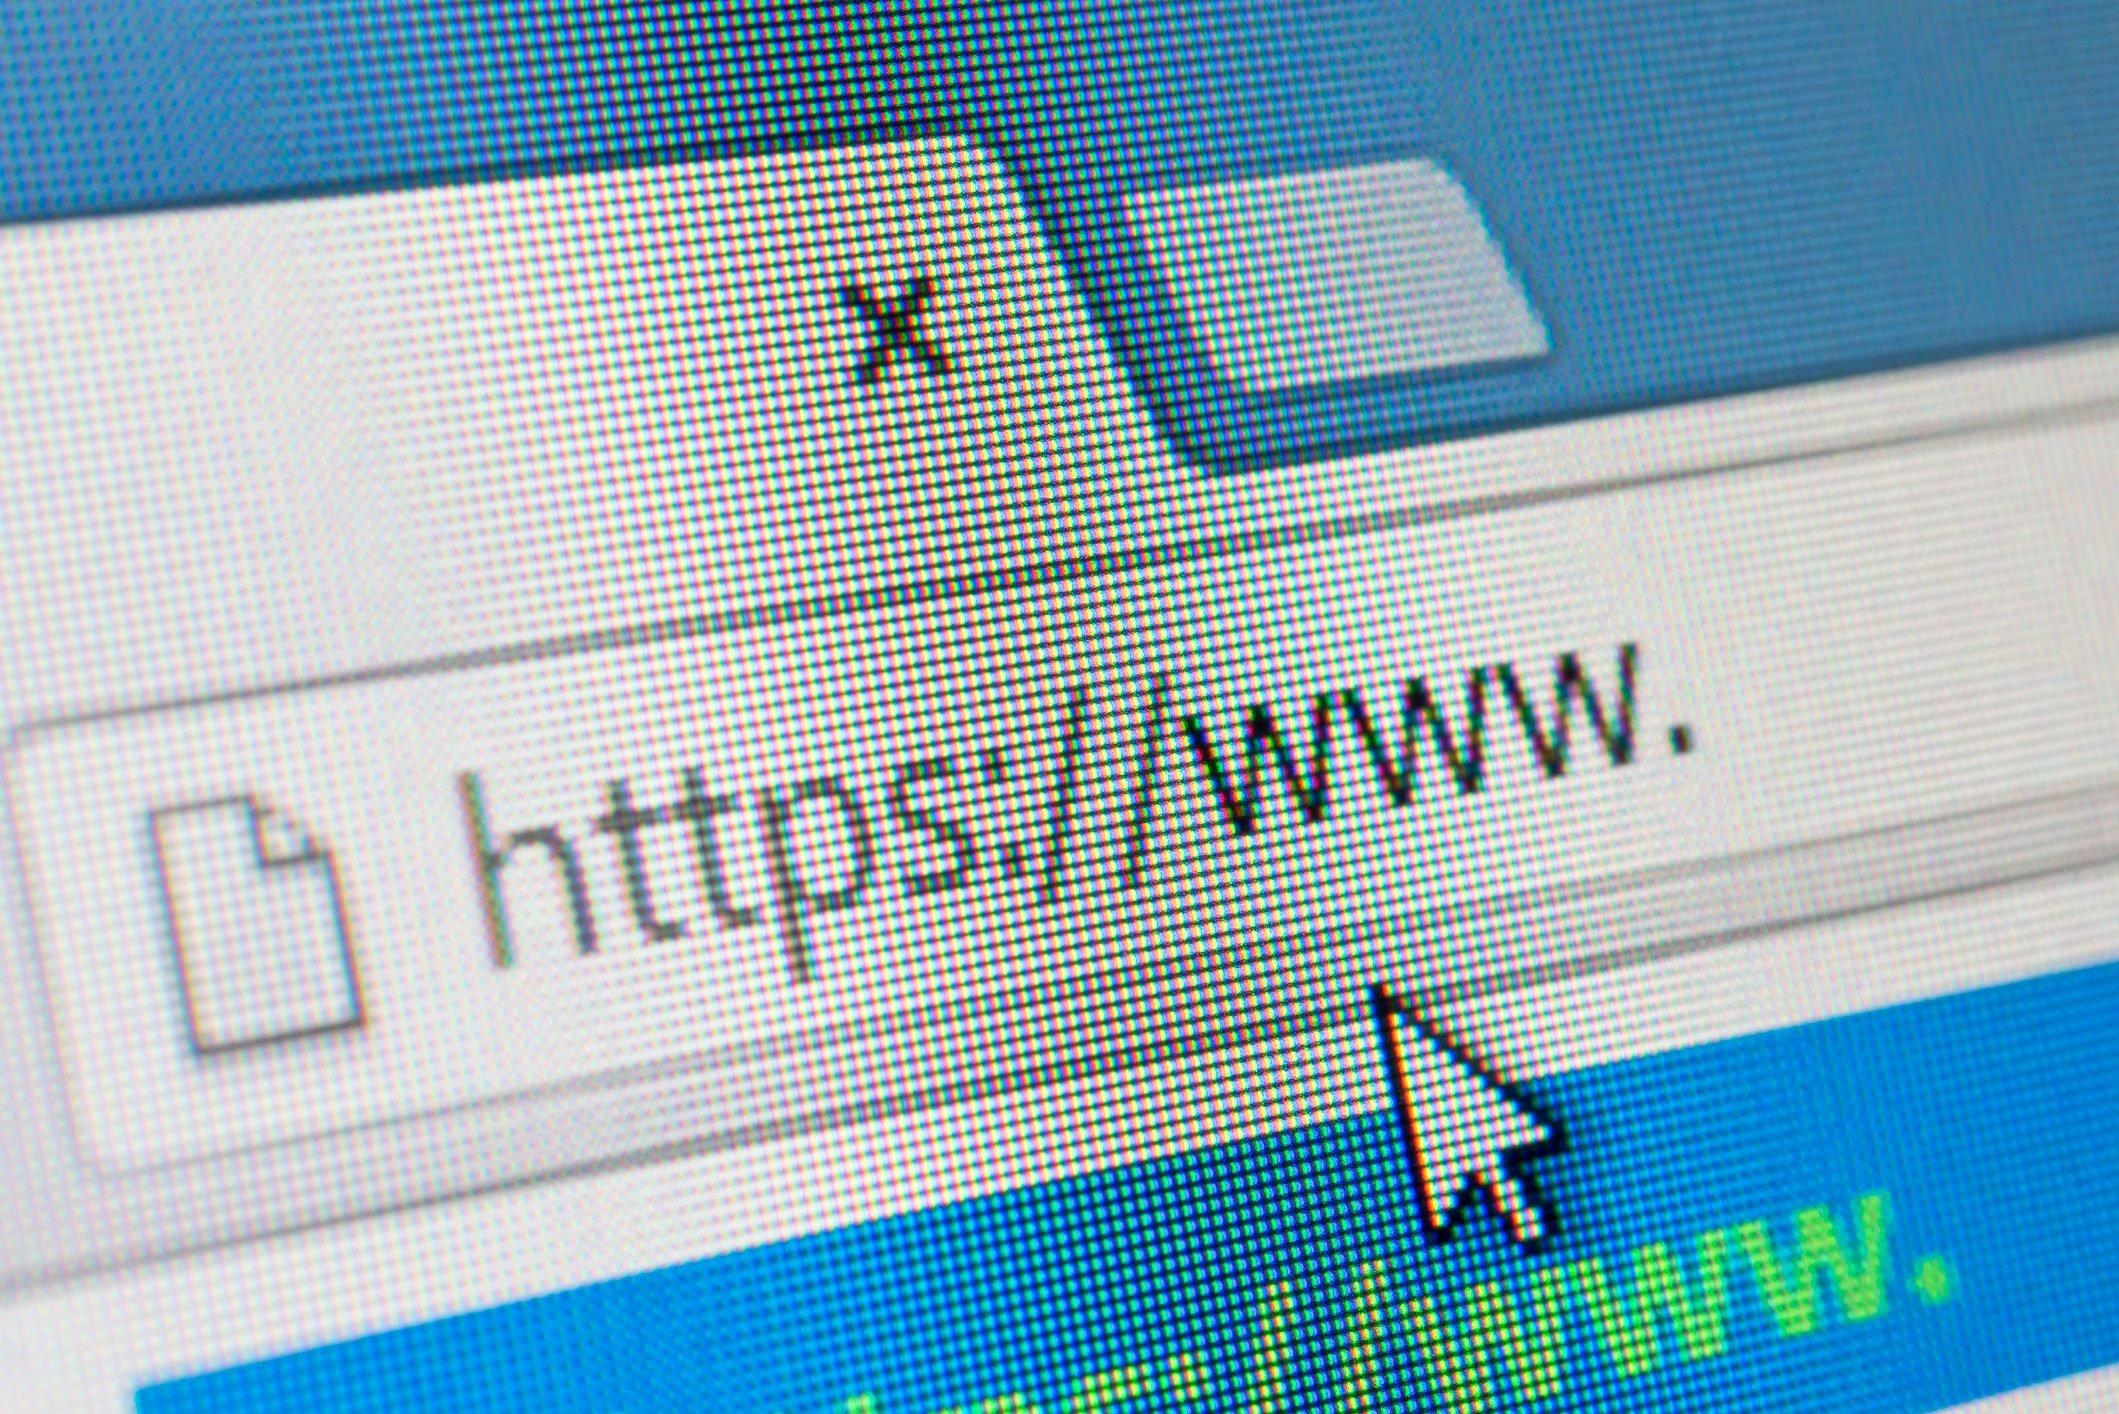 SSL website address